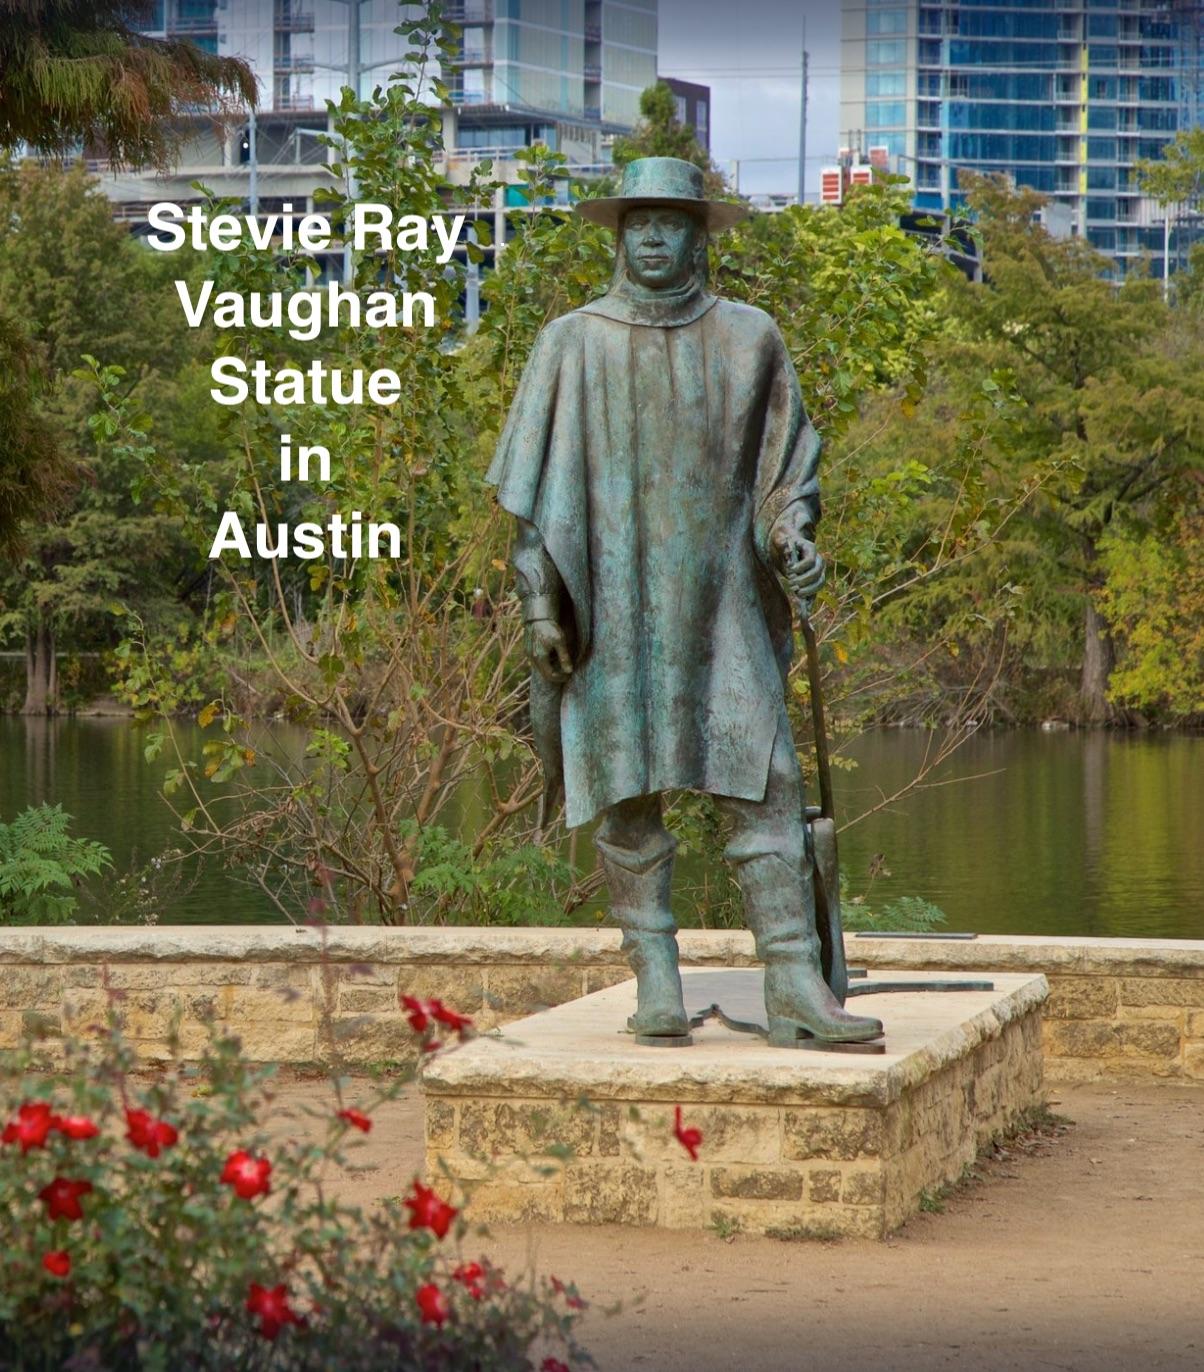 Statue of SRV in Austin TX